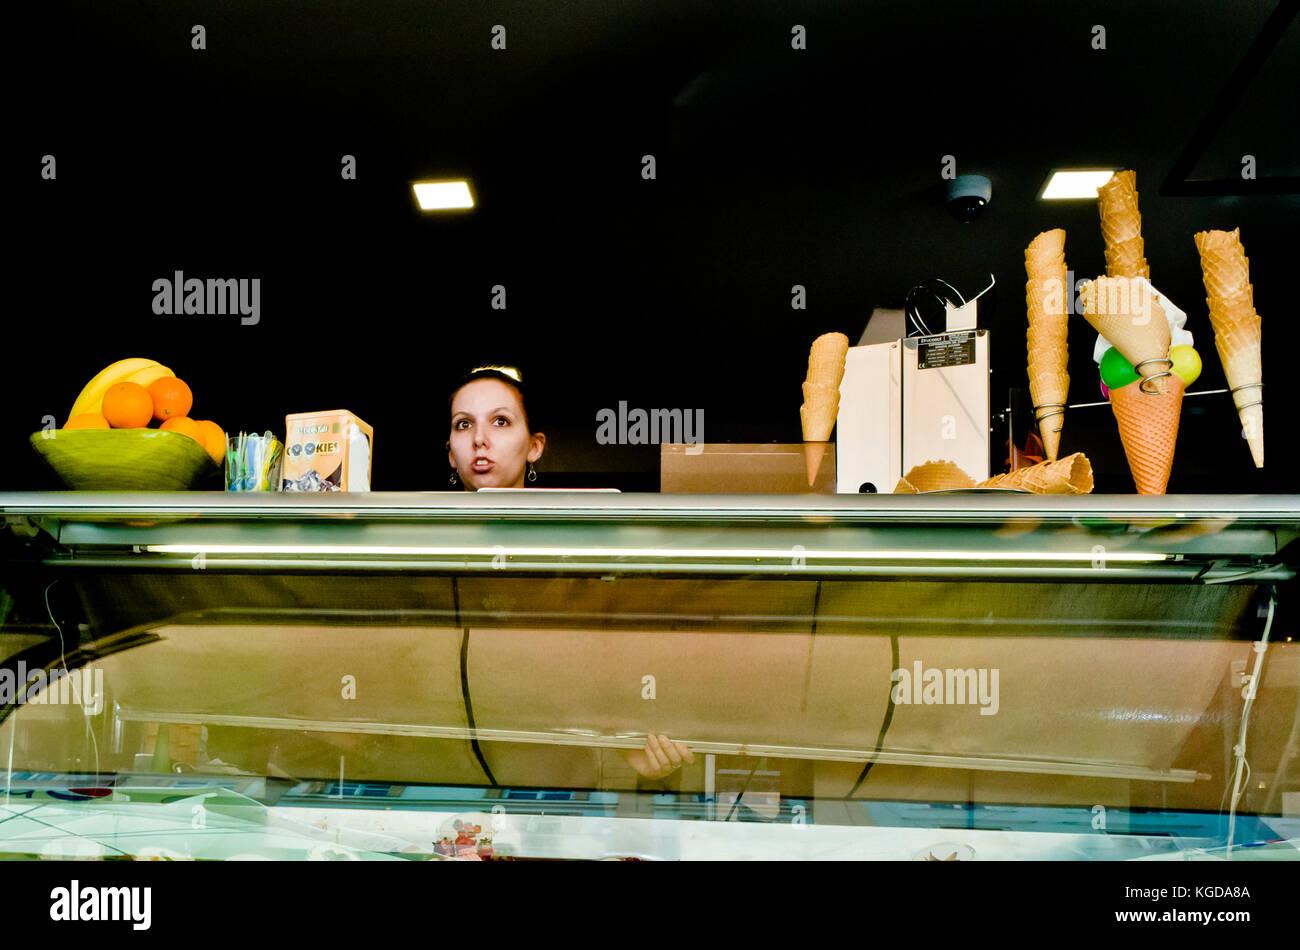 seller of ice creams in Olomouc, Czech republic - Stock Image